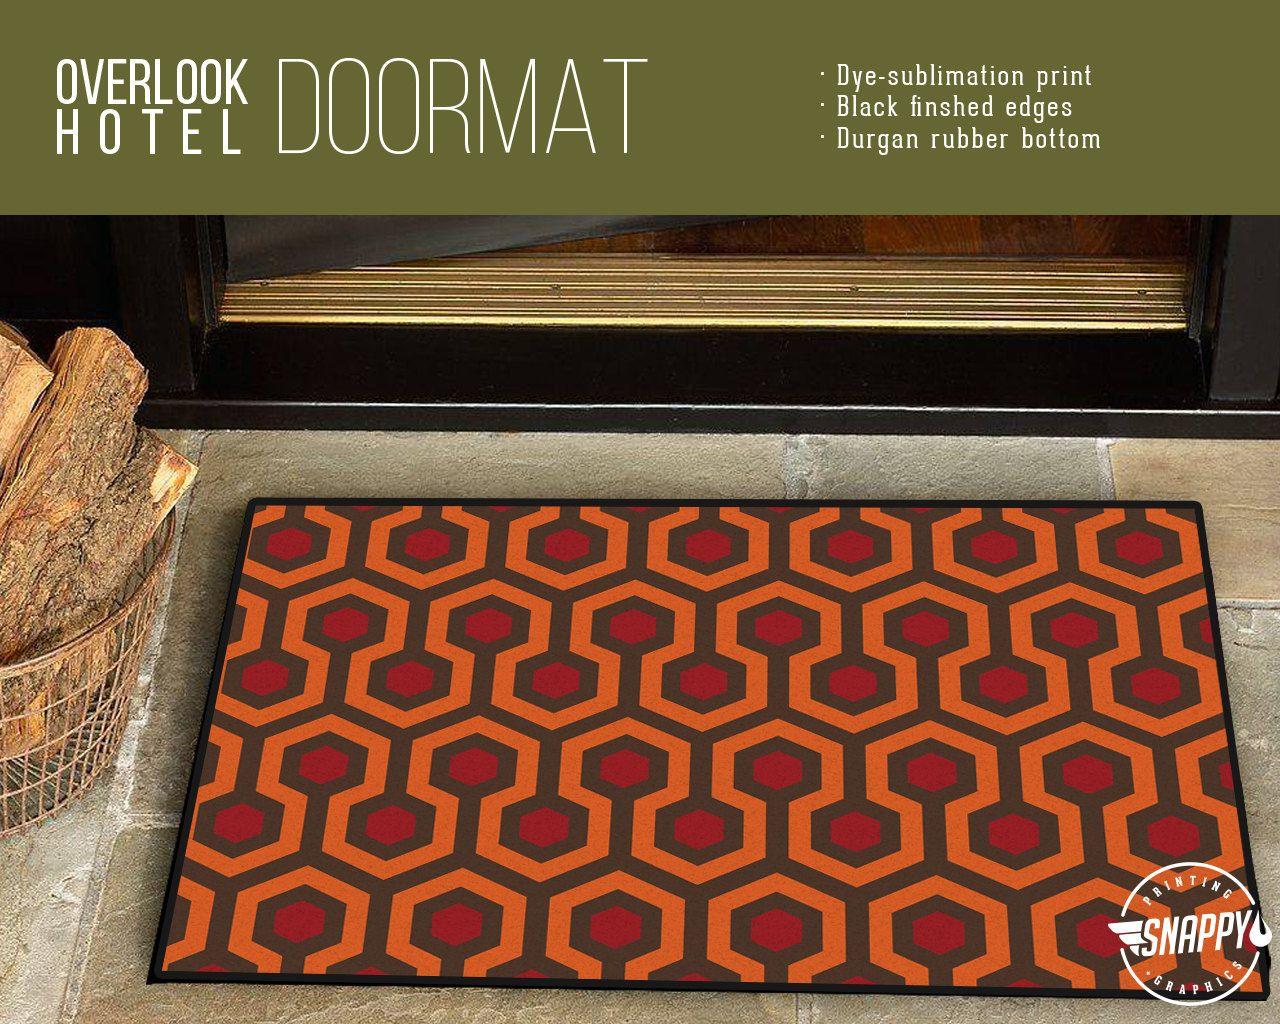 Overlook Hotel Carpet Pattern Welcome Mat Doormat Rug Etsy Hotel Carpet Patterned Carpet Overlook Hotel Carpet